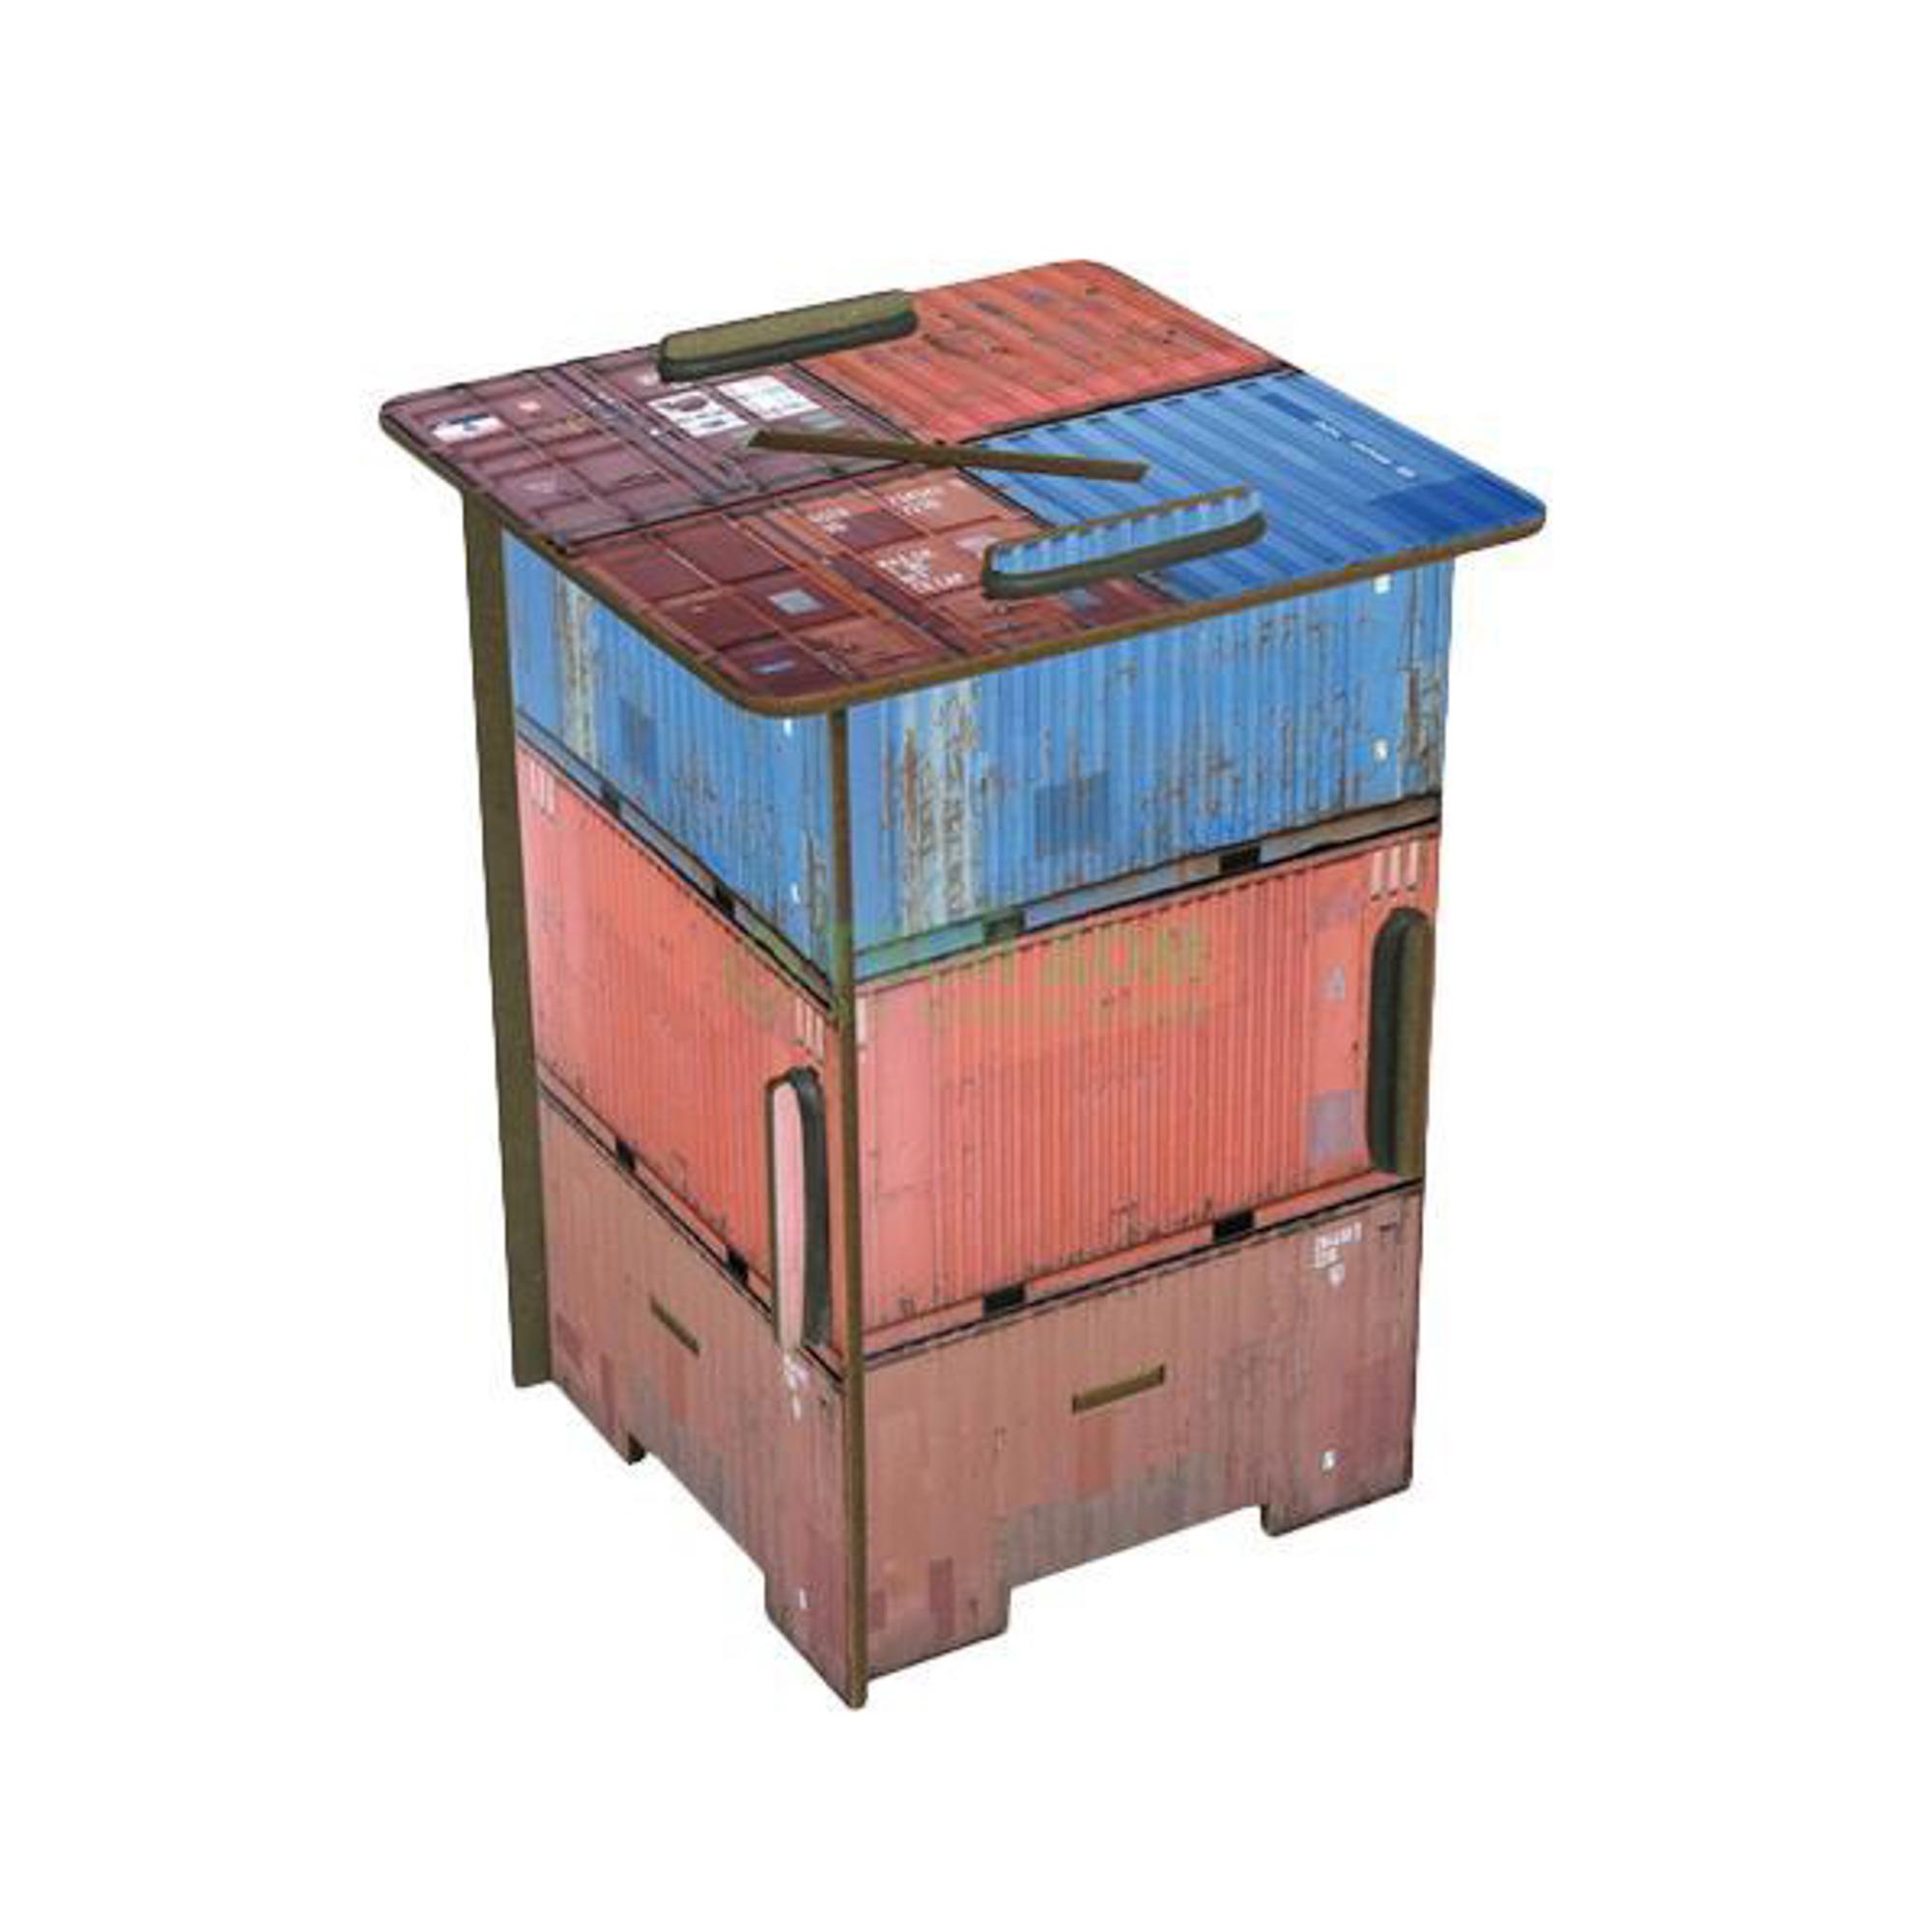 контейнеры Подставка Werkhaus для канцелярии контейнеры (PP 1704)